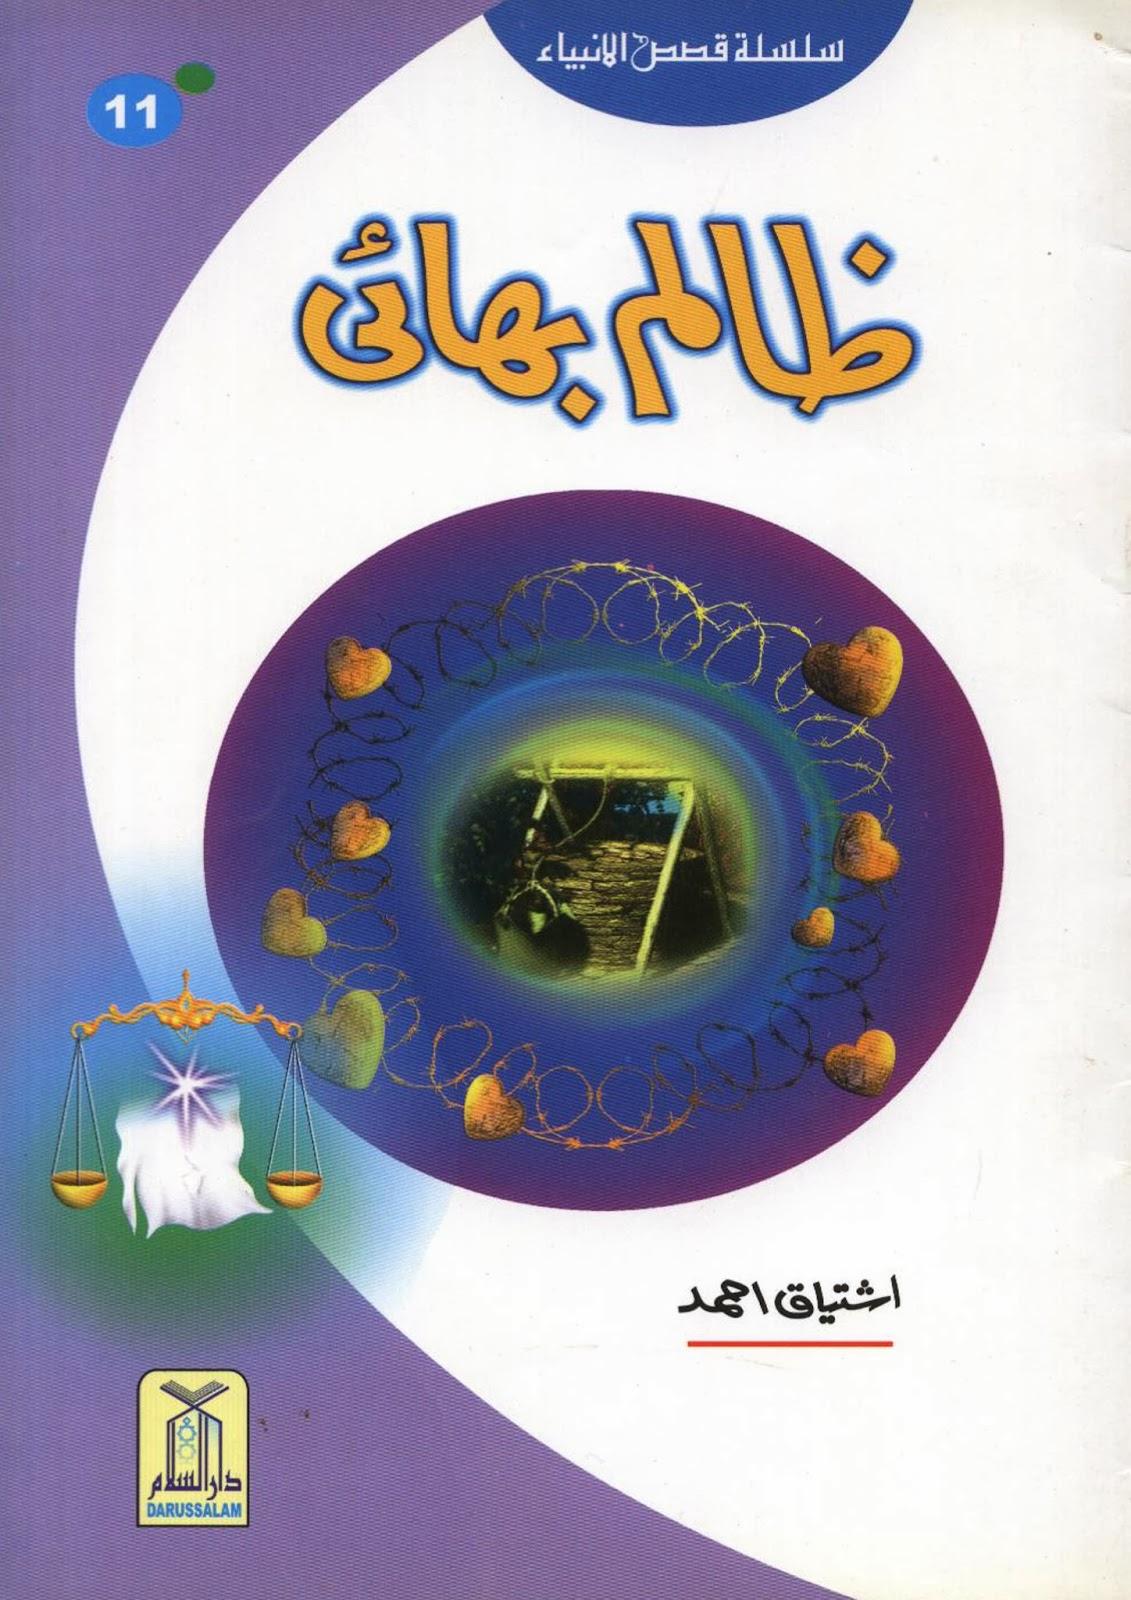 http://urduguru1.blogspot.com/2014/03/zalam-bhai-yousaf-as.html